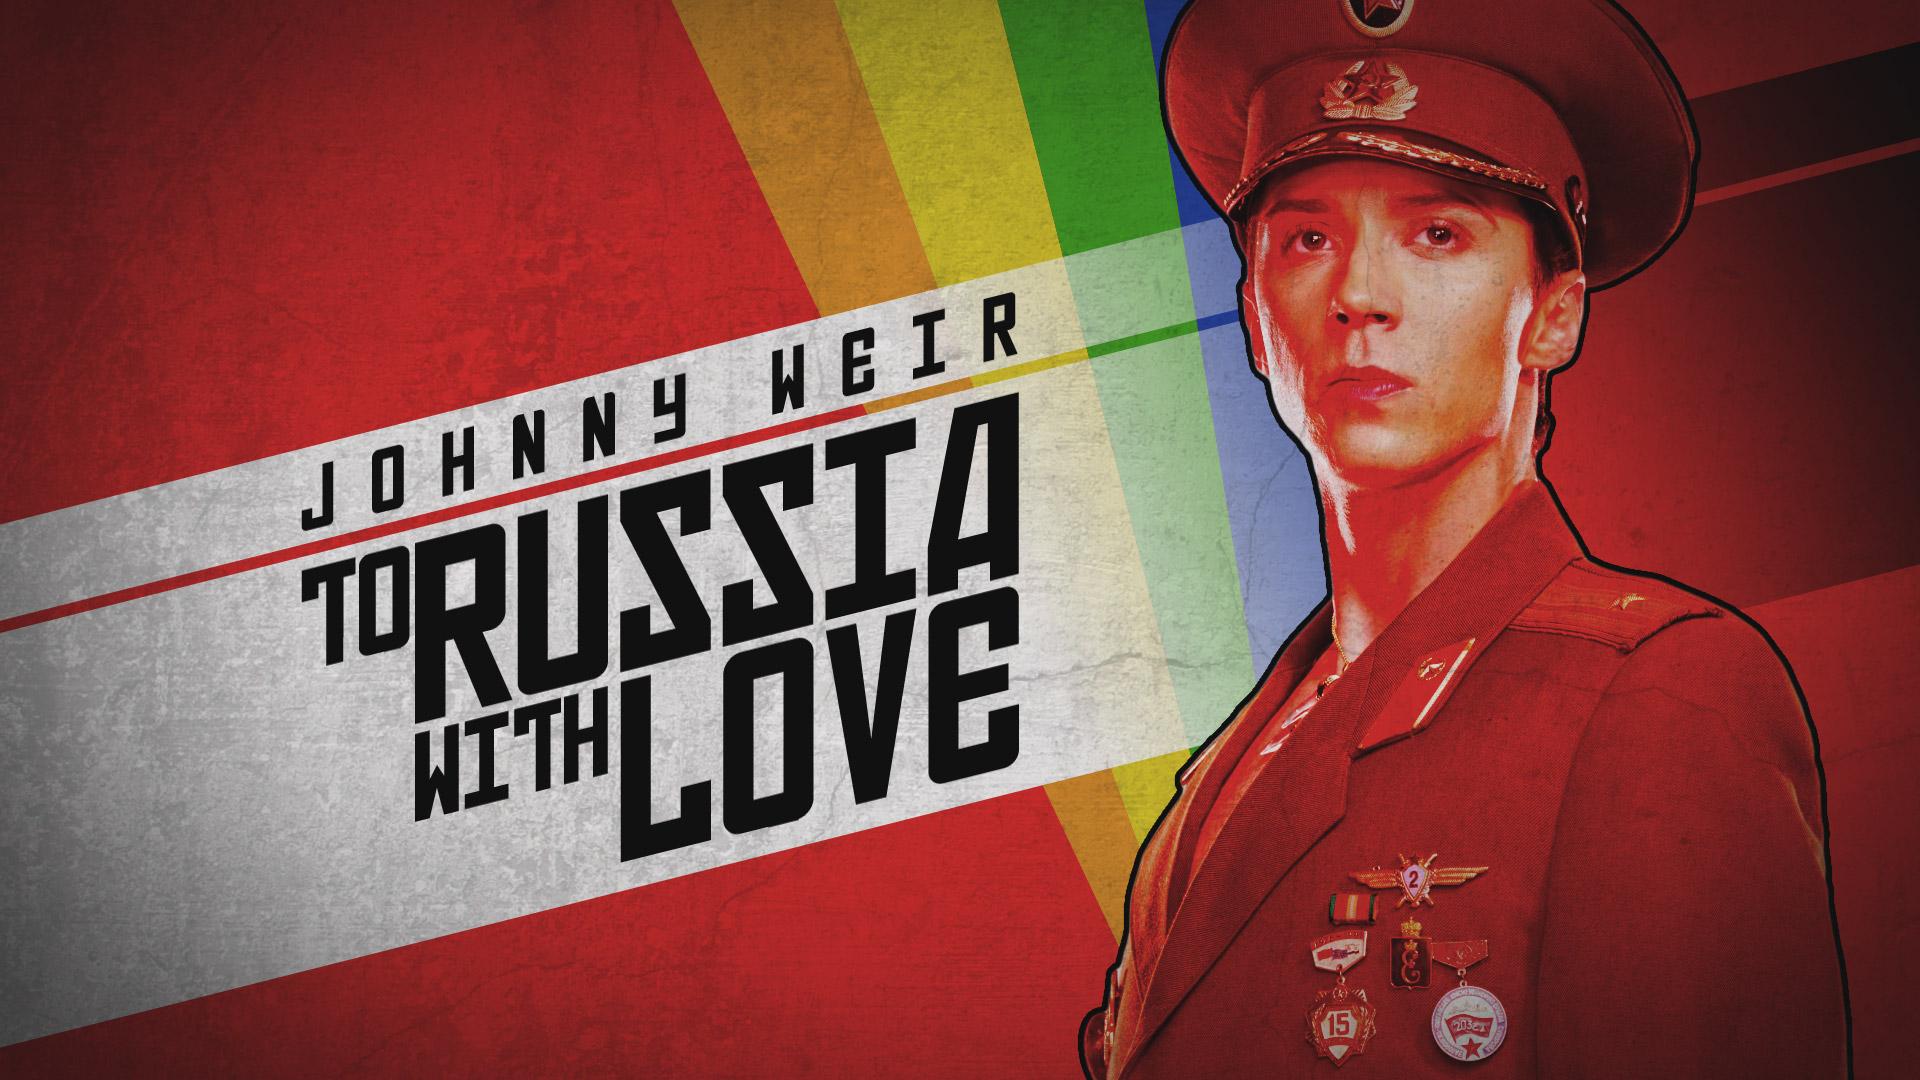 ToRussia_V2_01.jpg